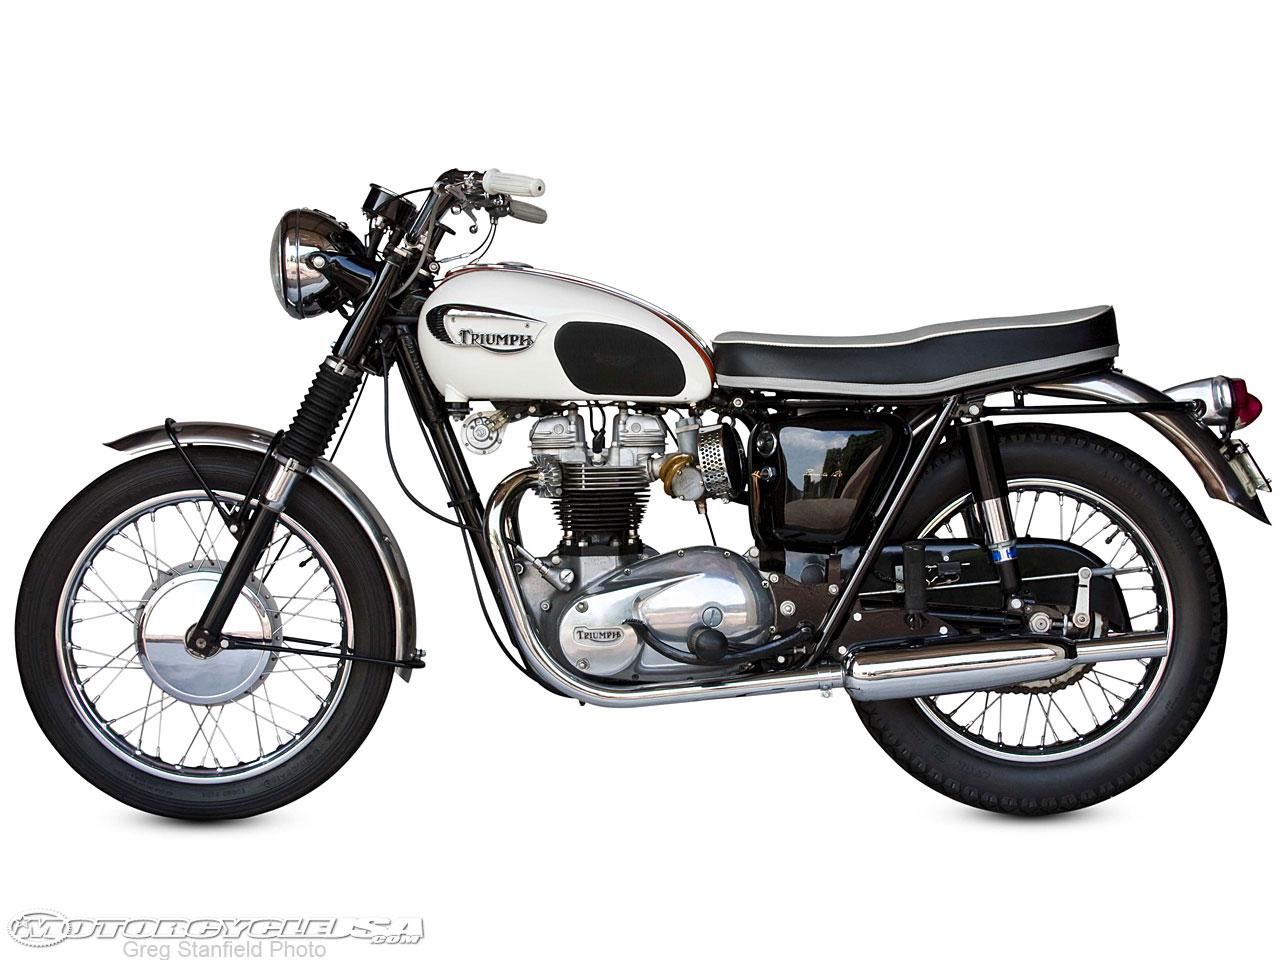 triumph motorcycle motorcycles bmw classic bikes motorbikes usa bonneville motor cycles kentucky museum enduro honda motocycles wallpapers moto 1966 arts